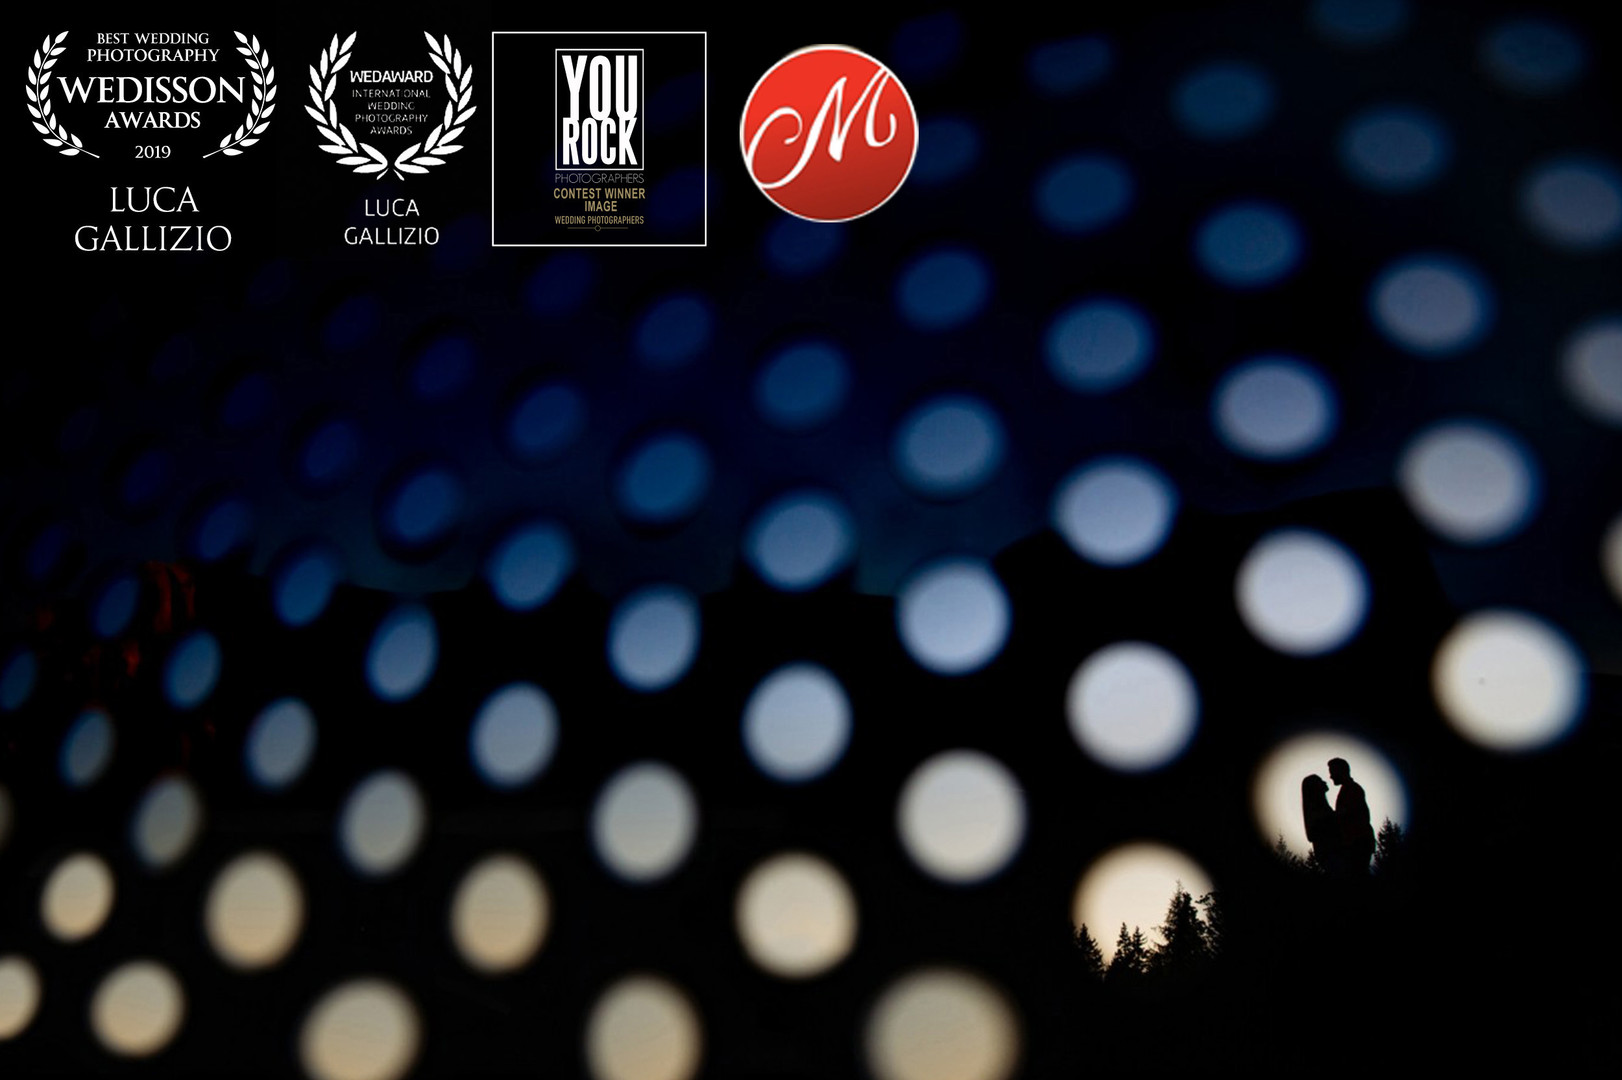 italian-wedding-photographer-award